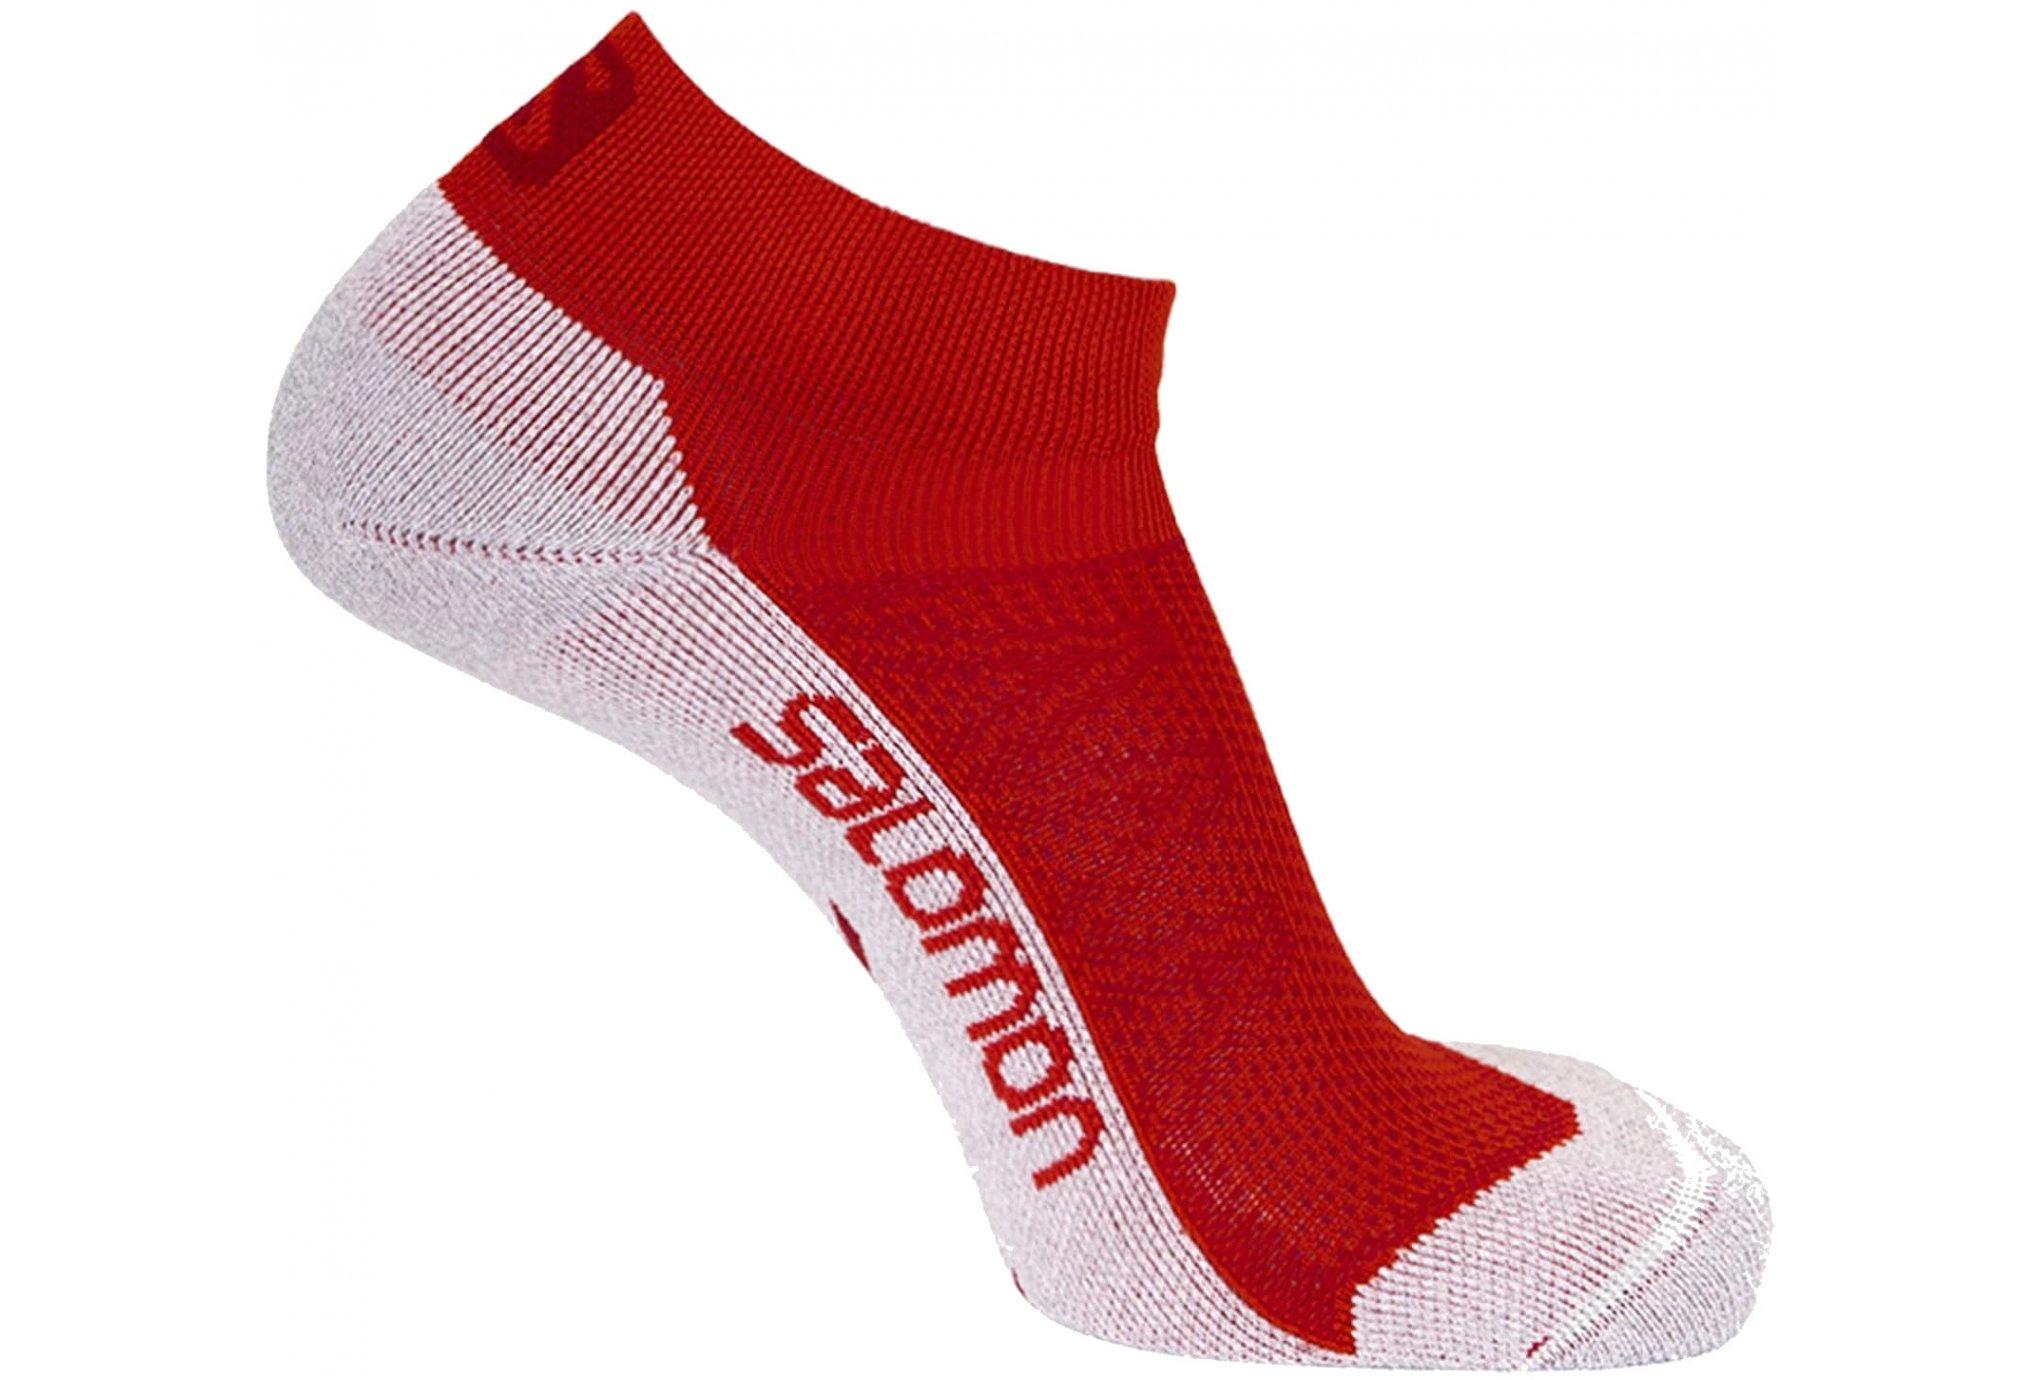 Salomon Speedcross Low Chaussettes